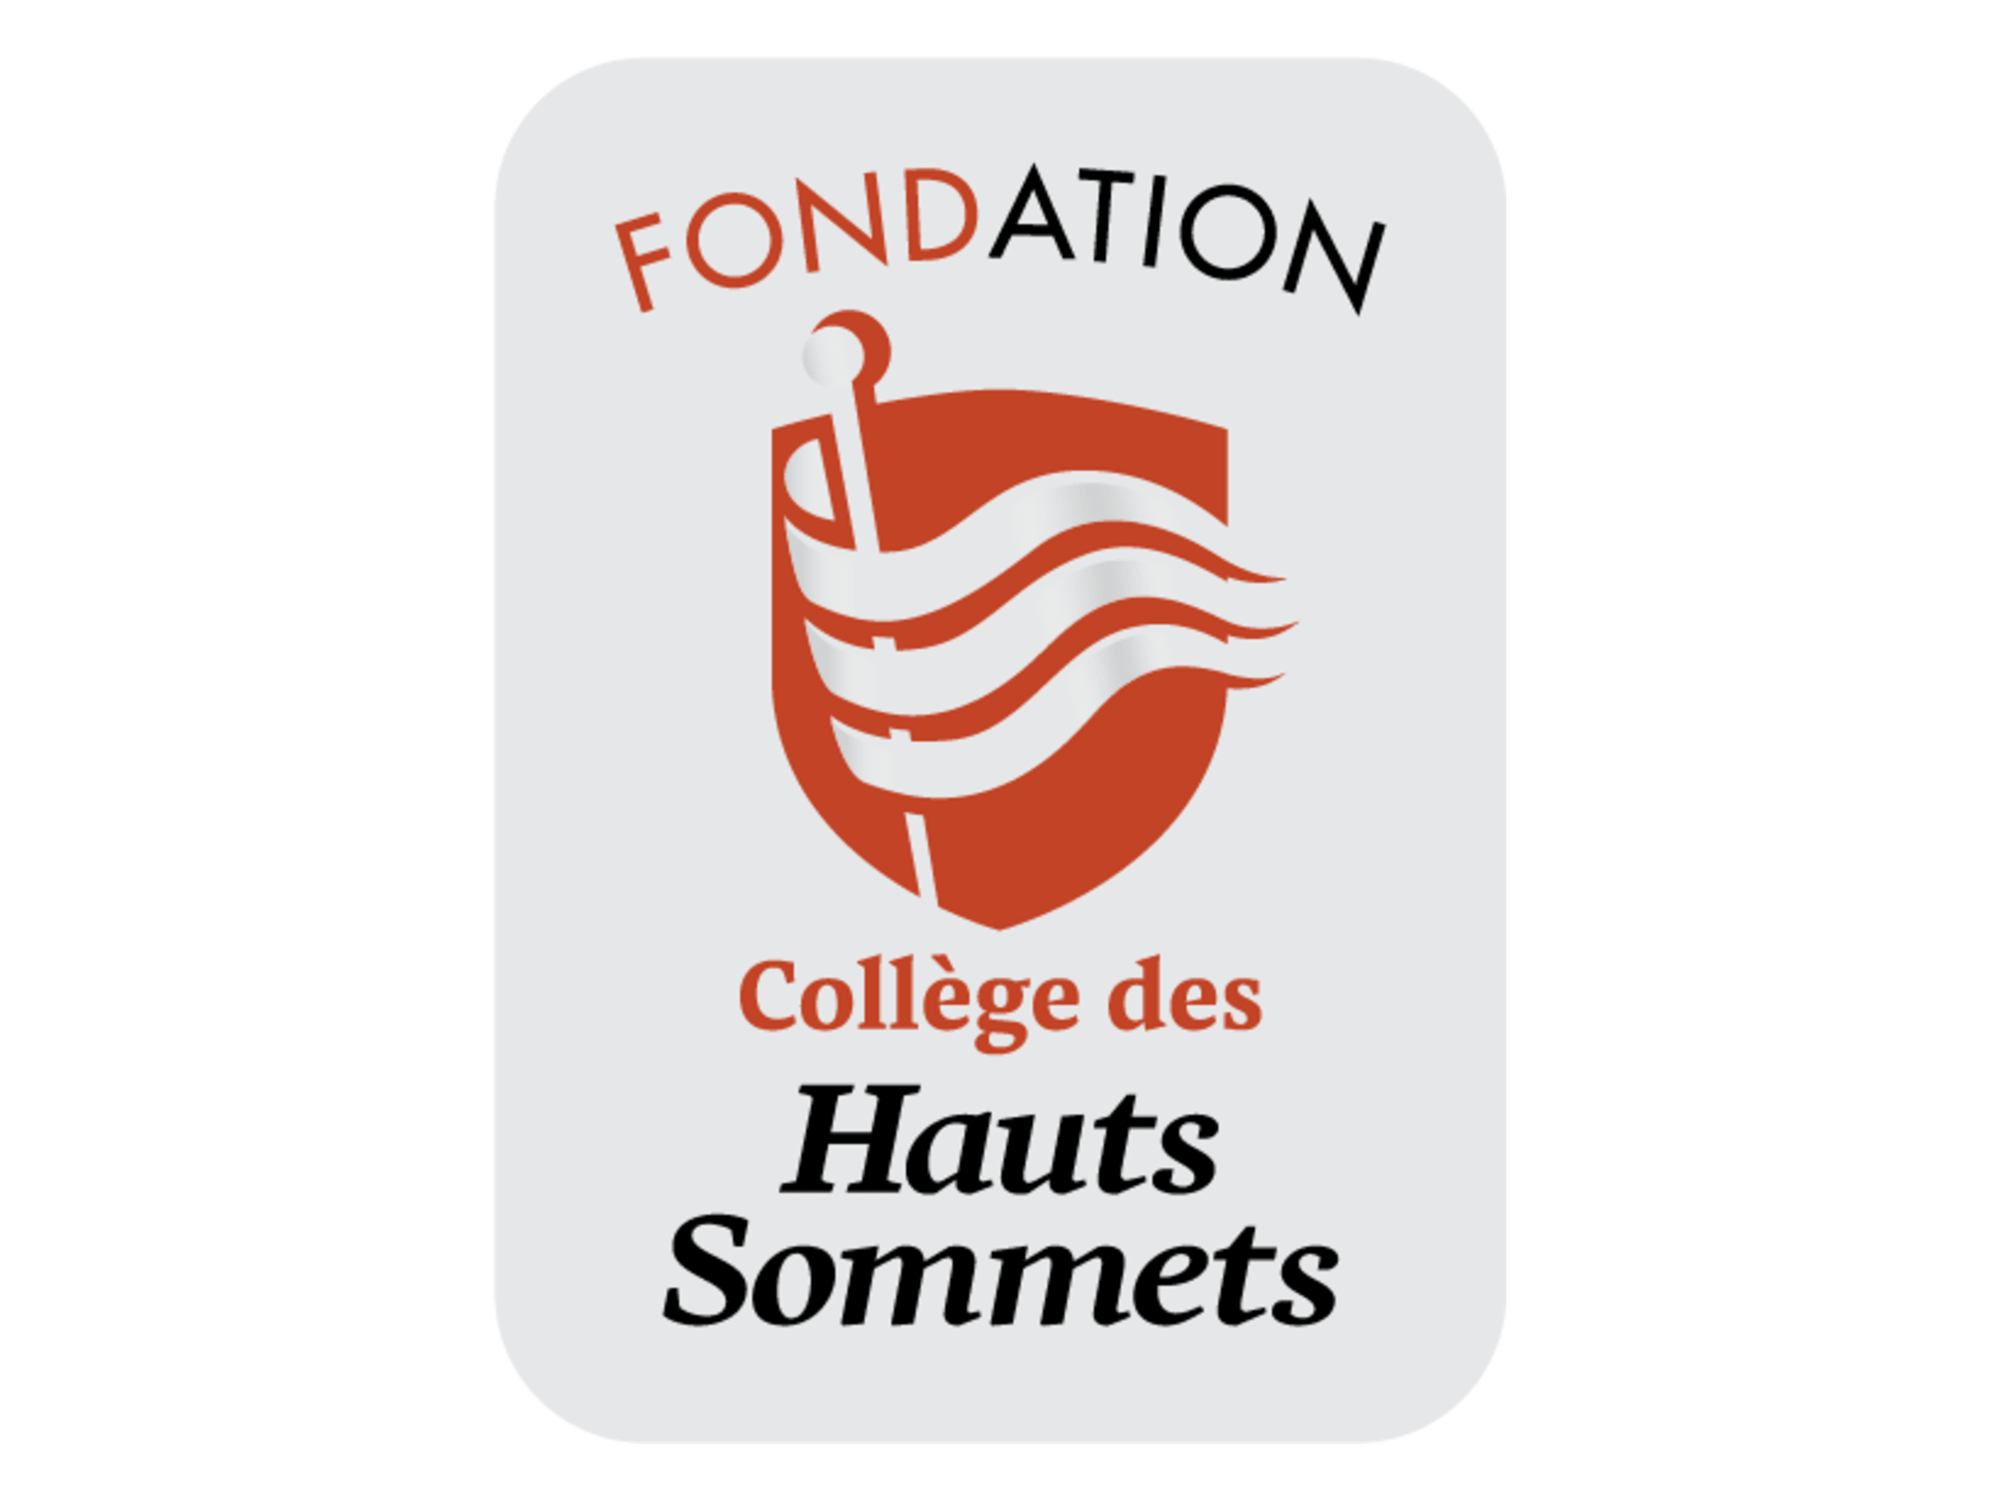 Fondation.png